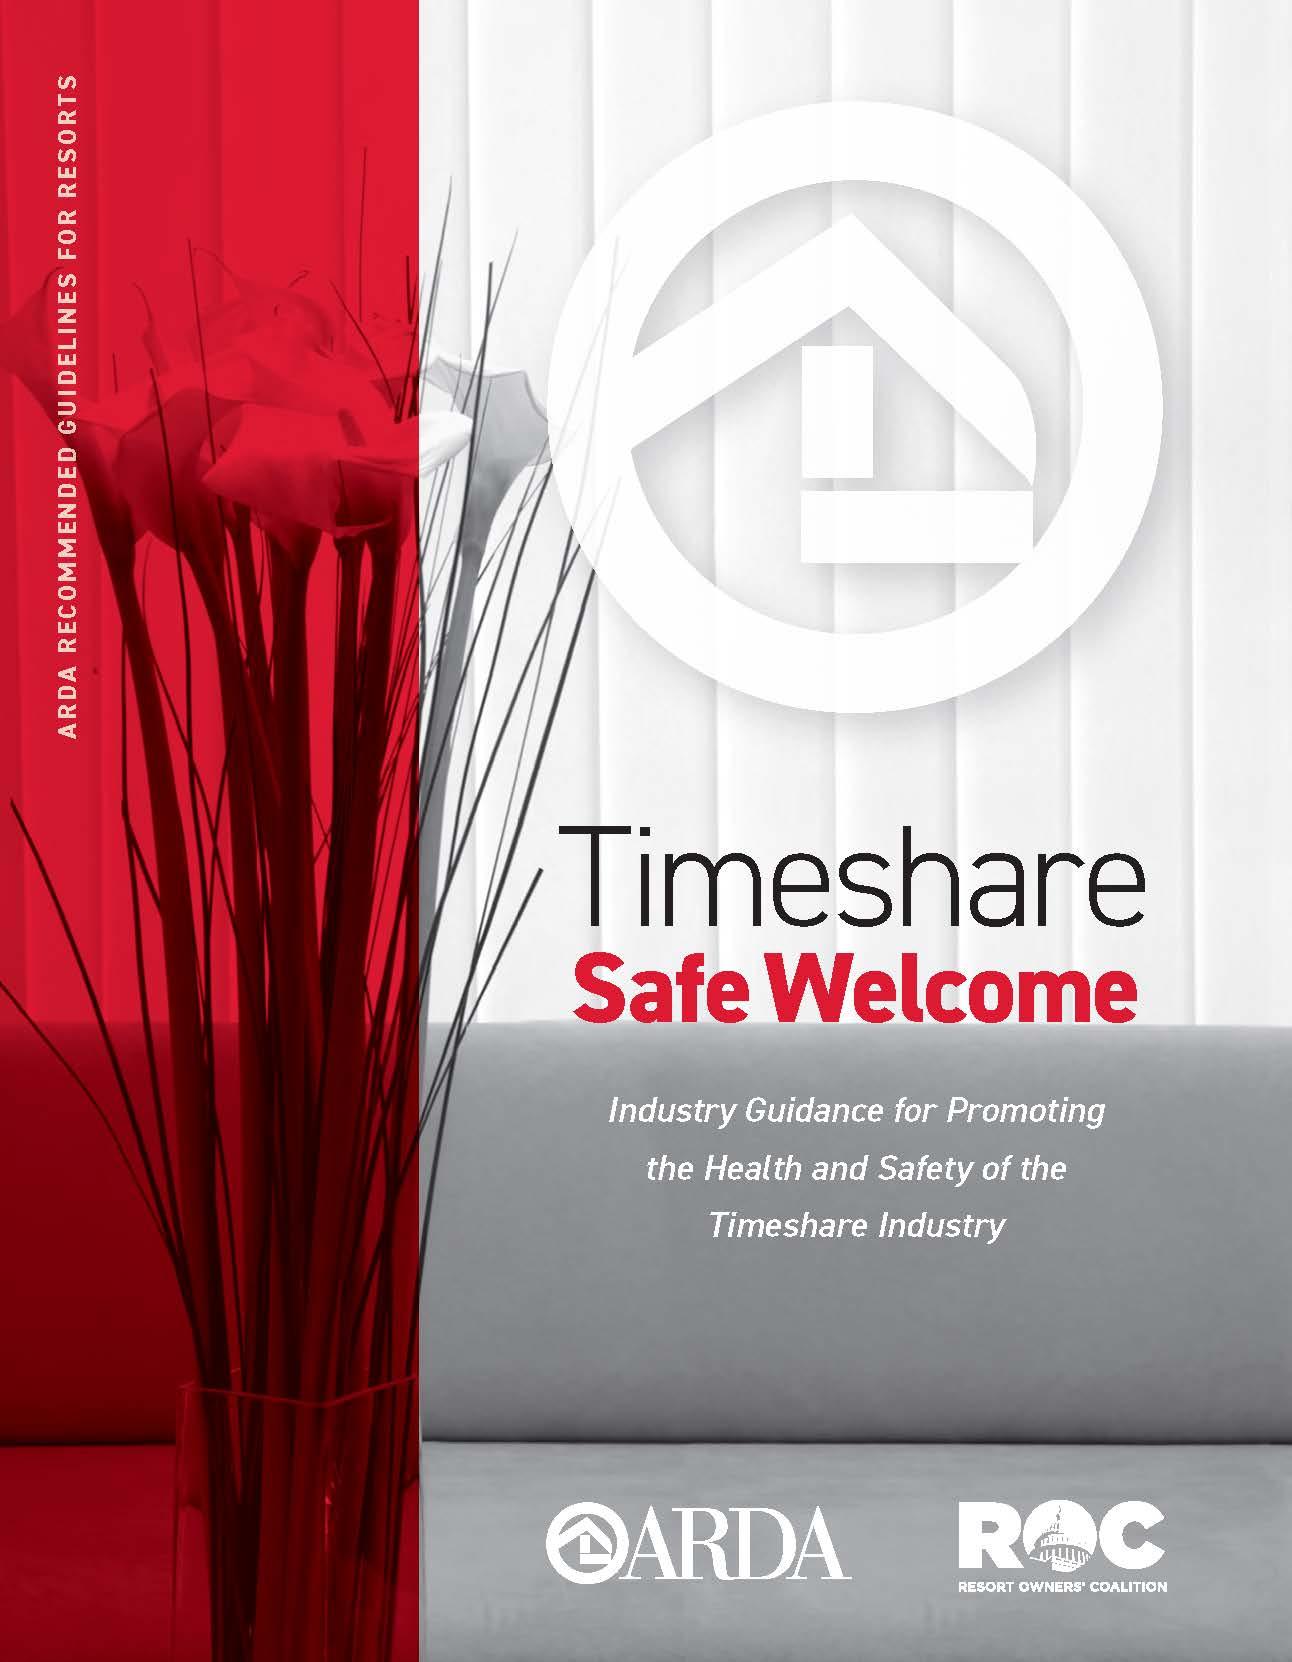 ARDA Timeshare Safe Welcome